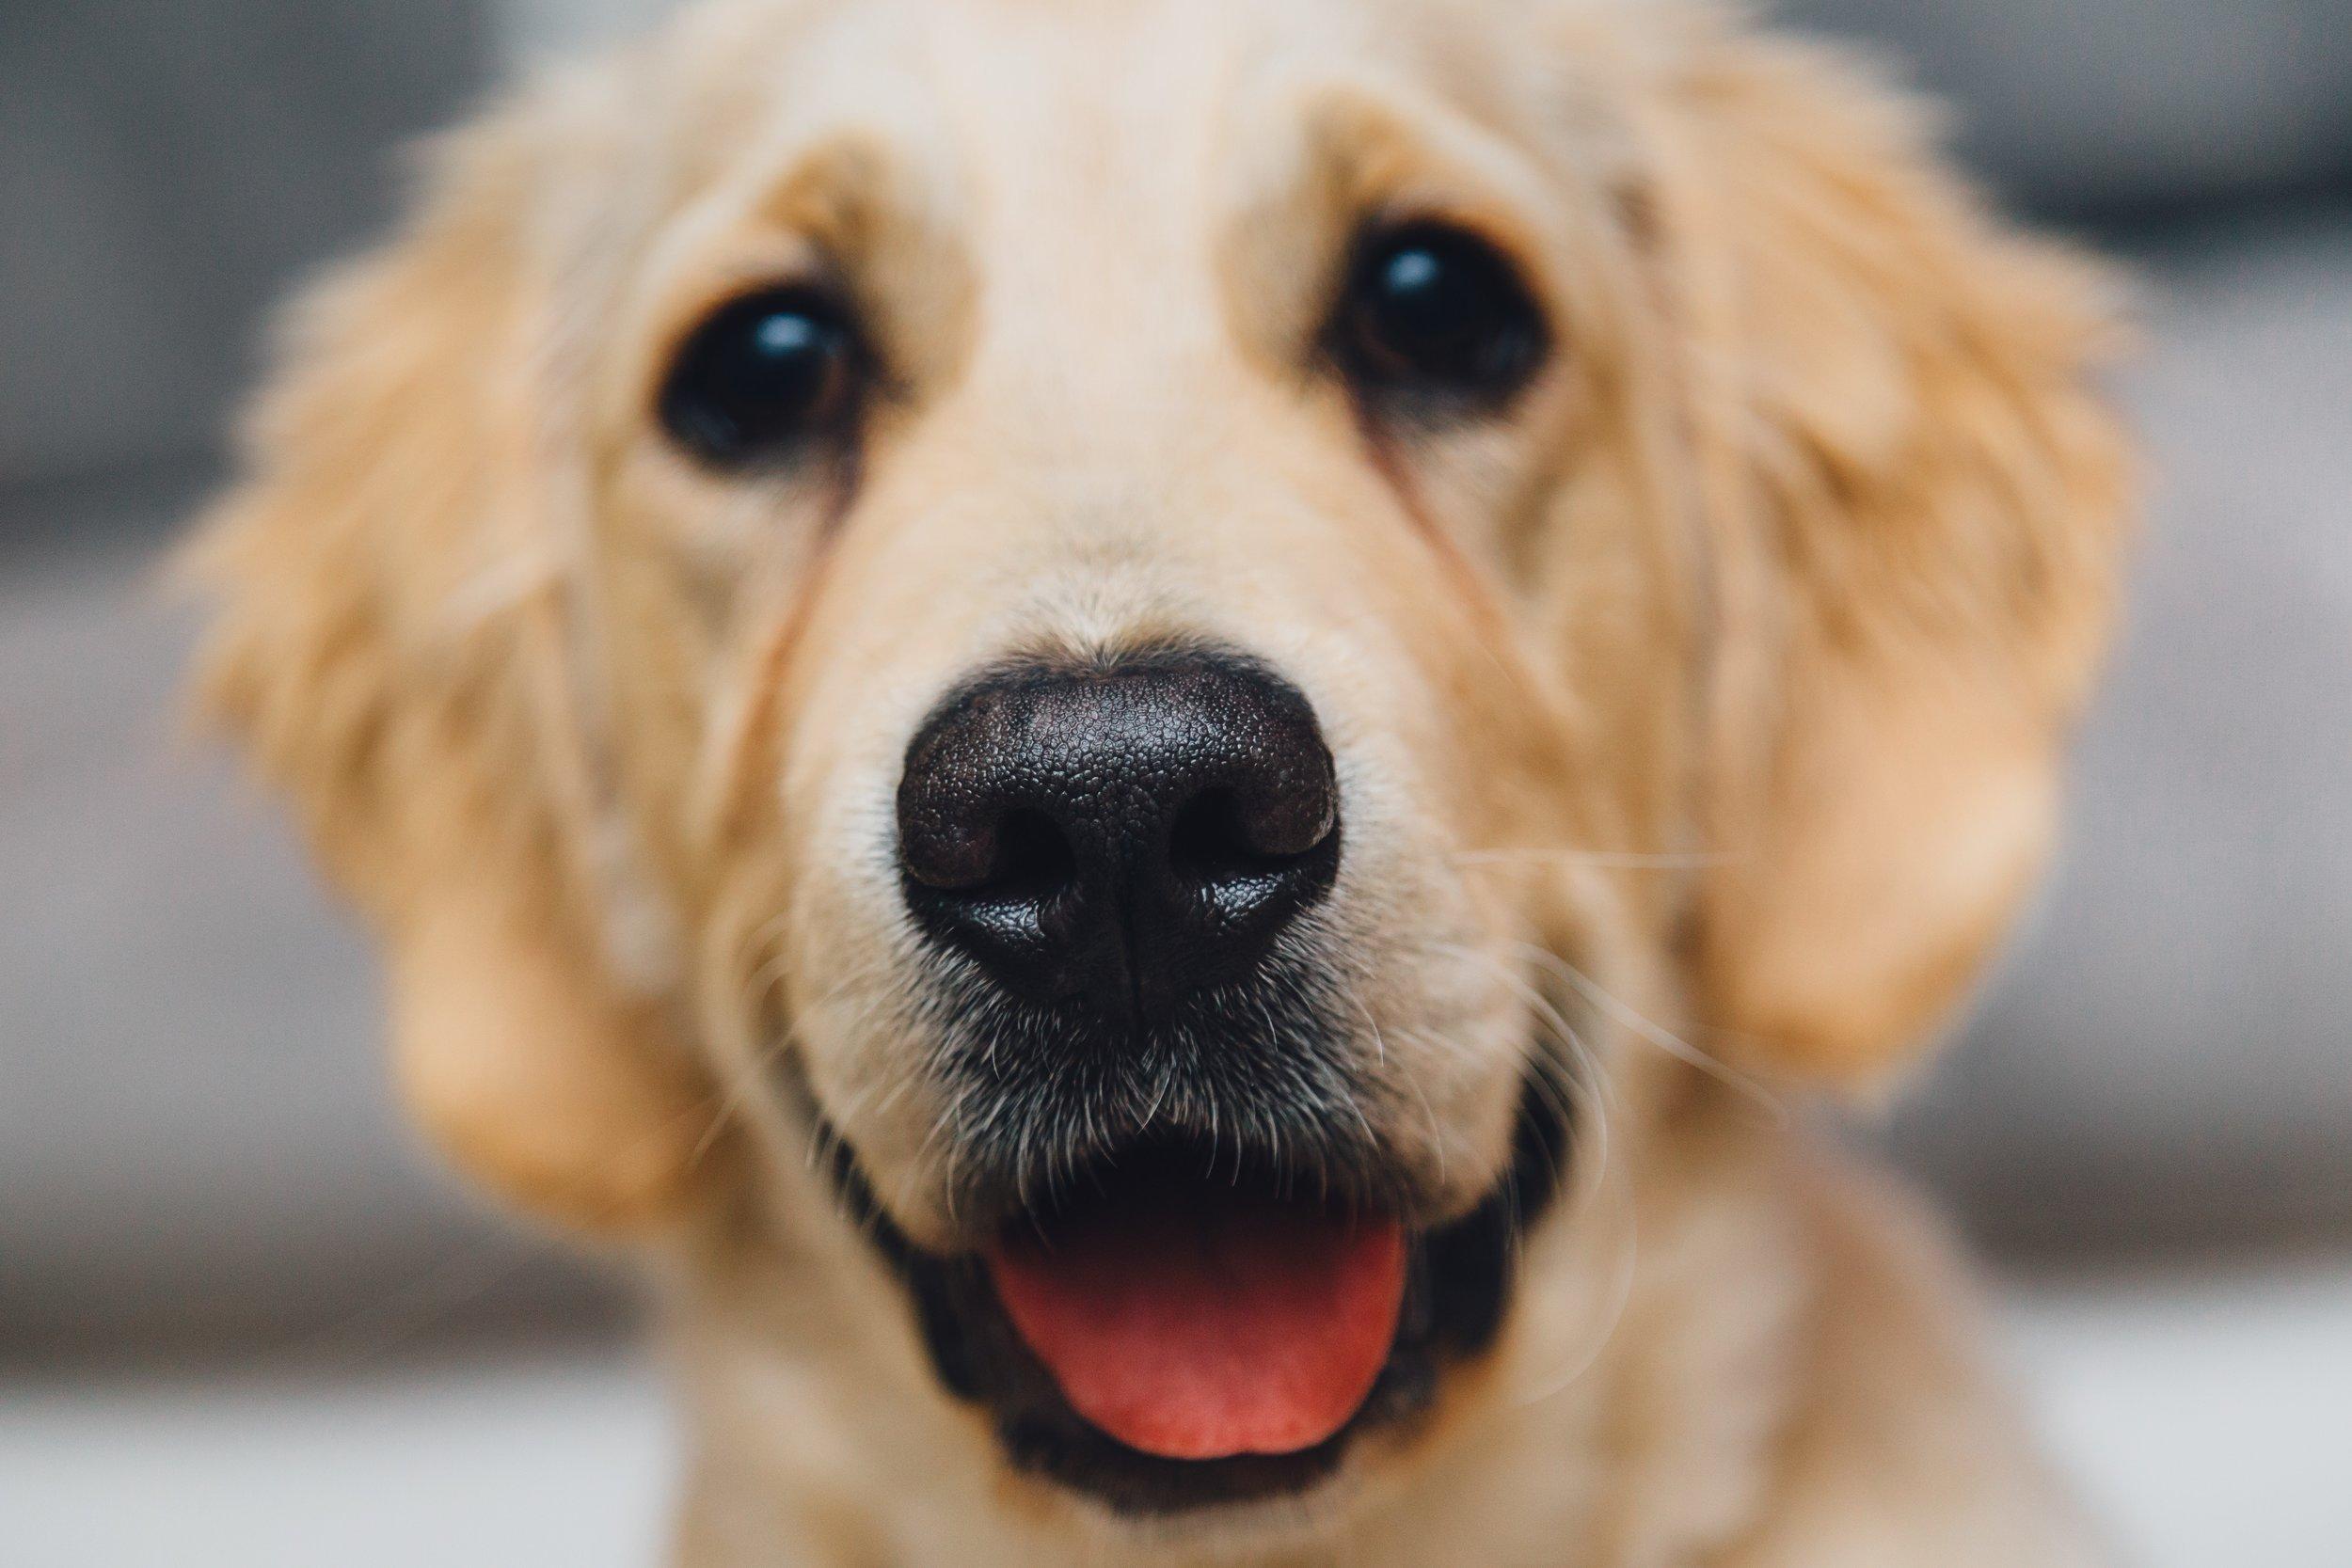 animal-dog-focus-7720.jpg